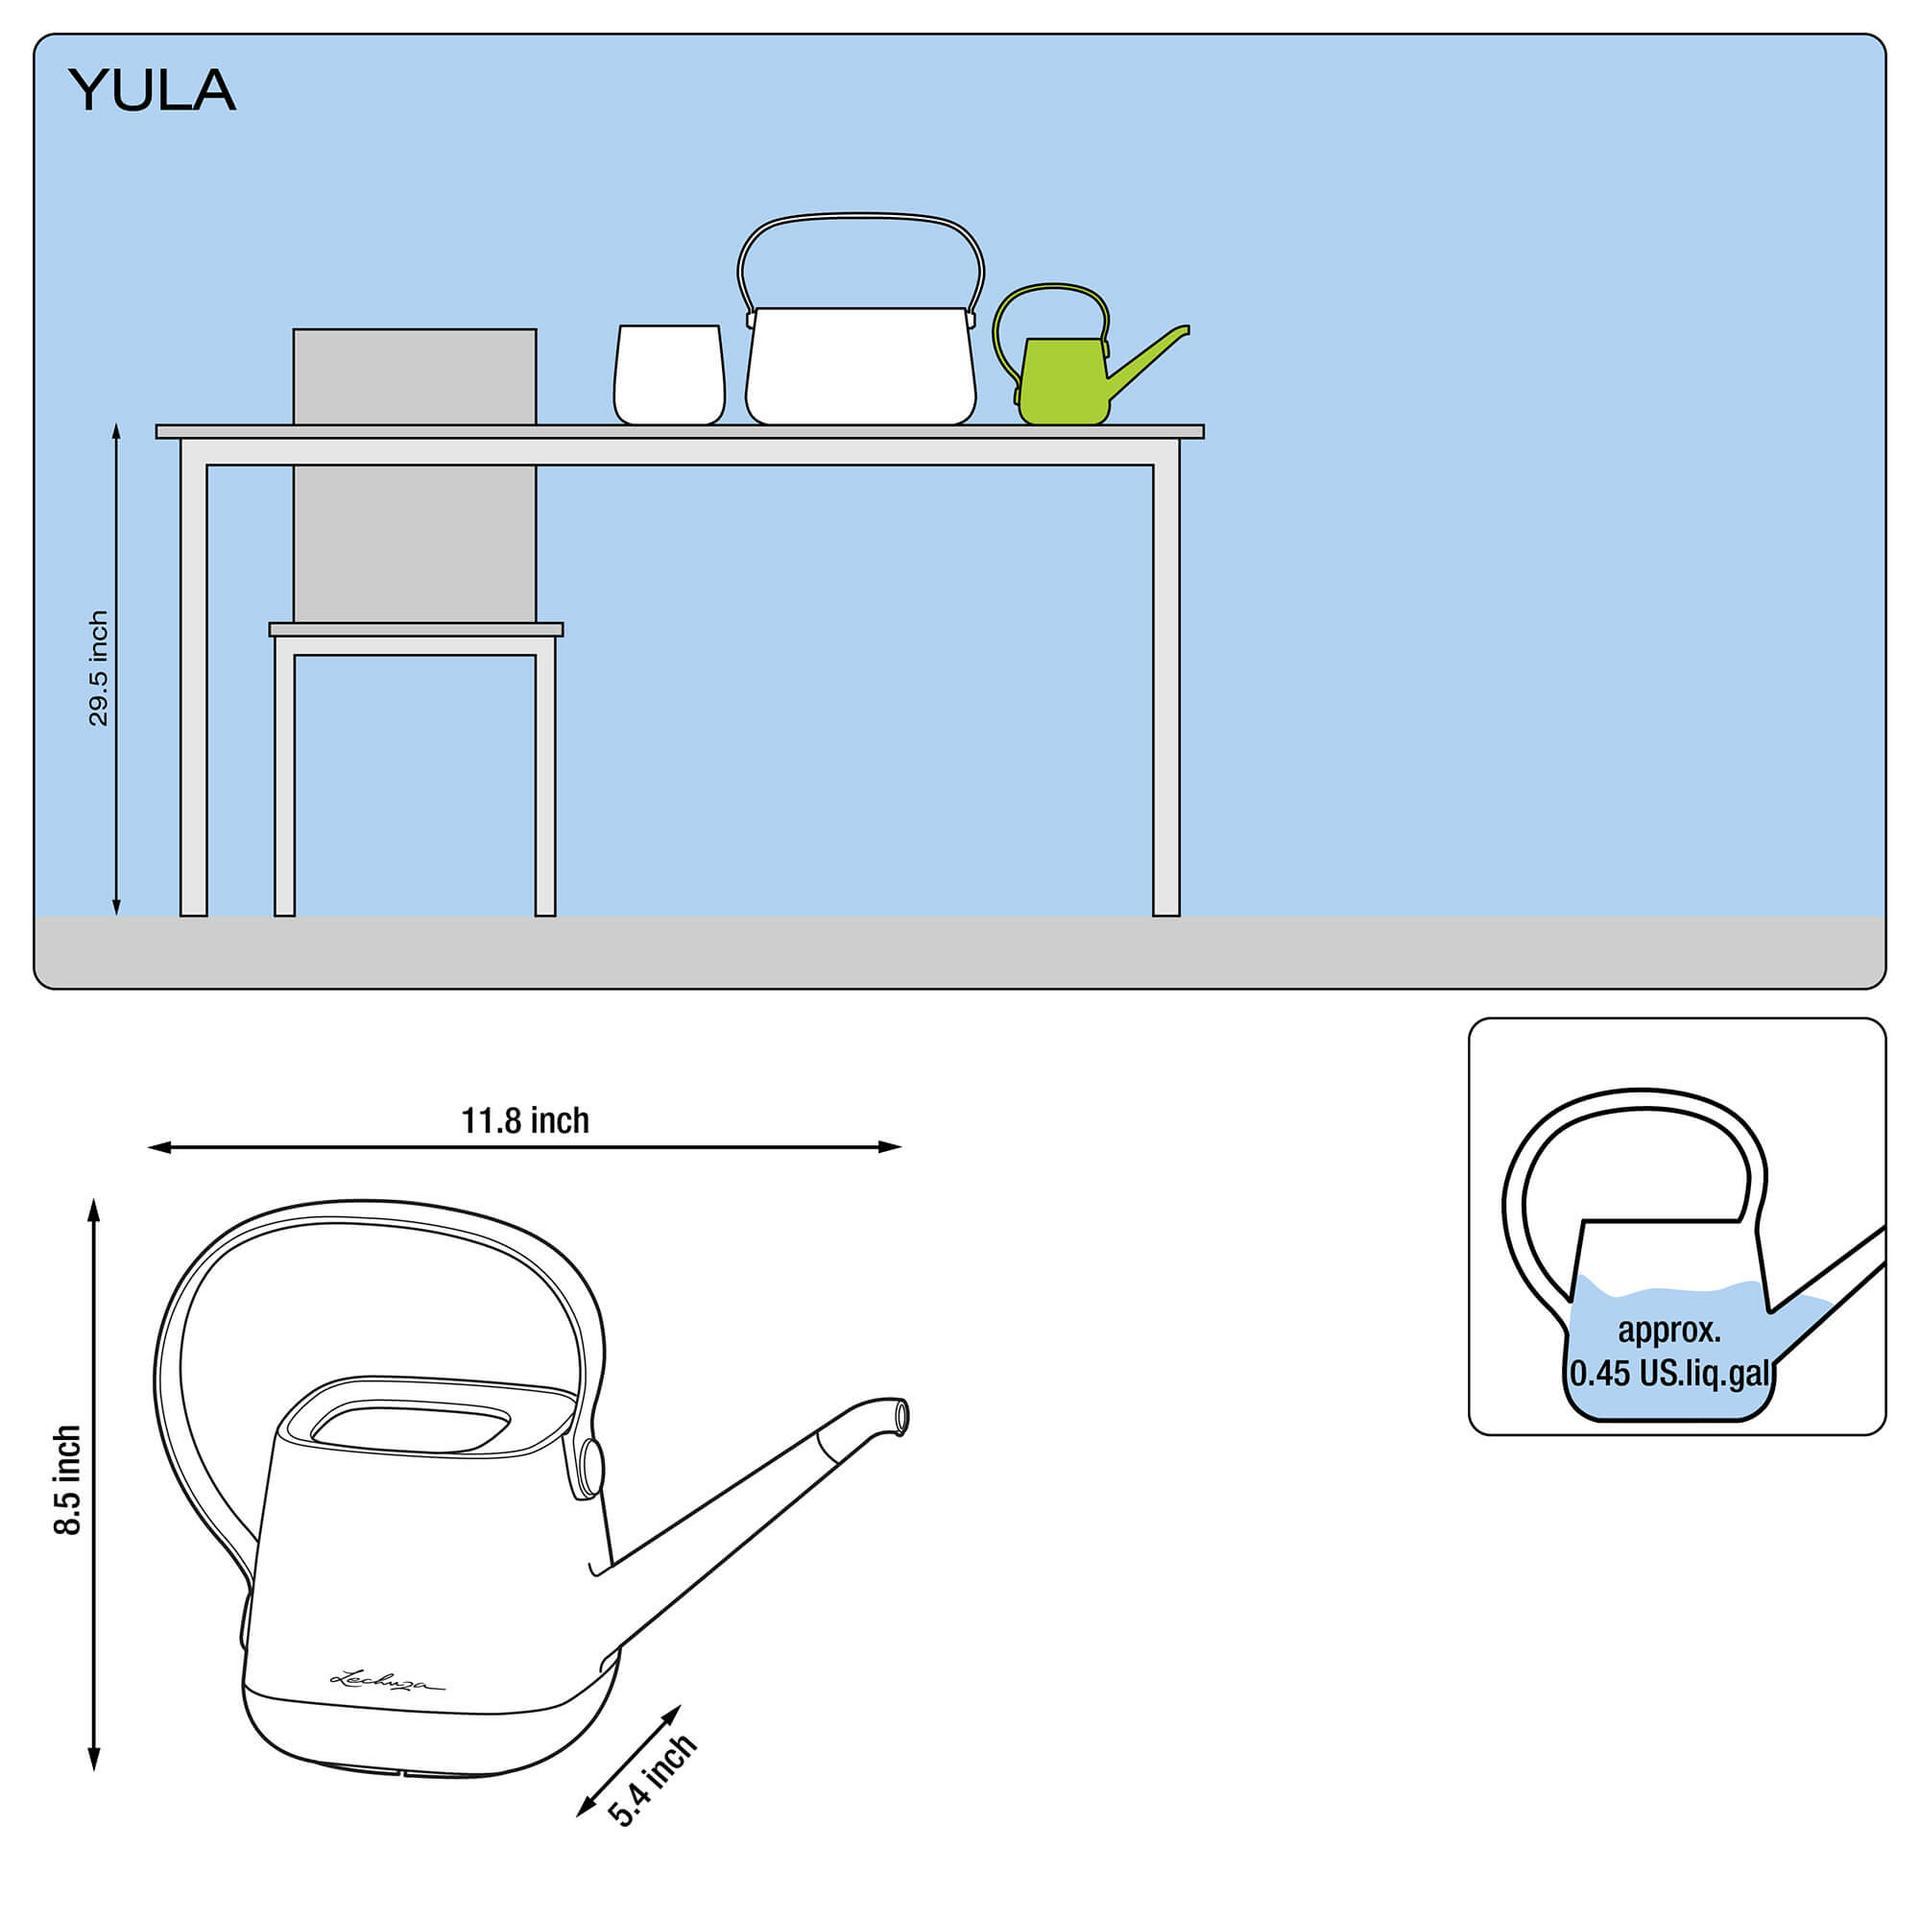 le_yula-giesskanne_product_addi_nz_us